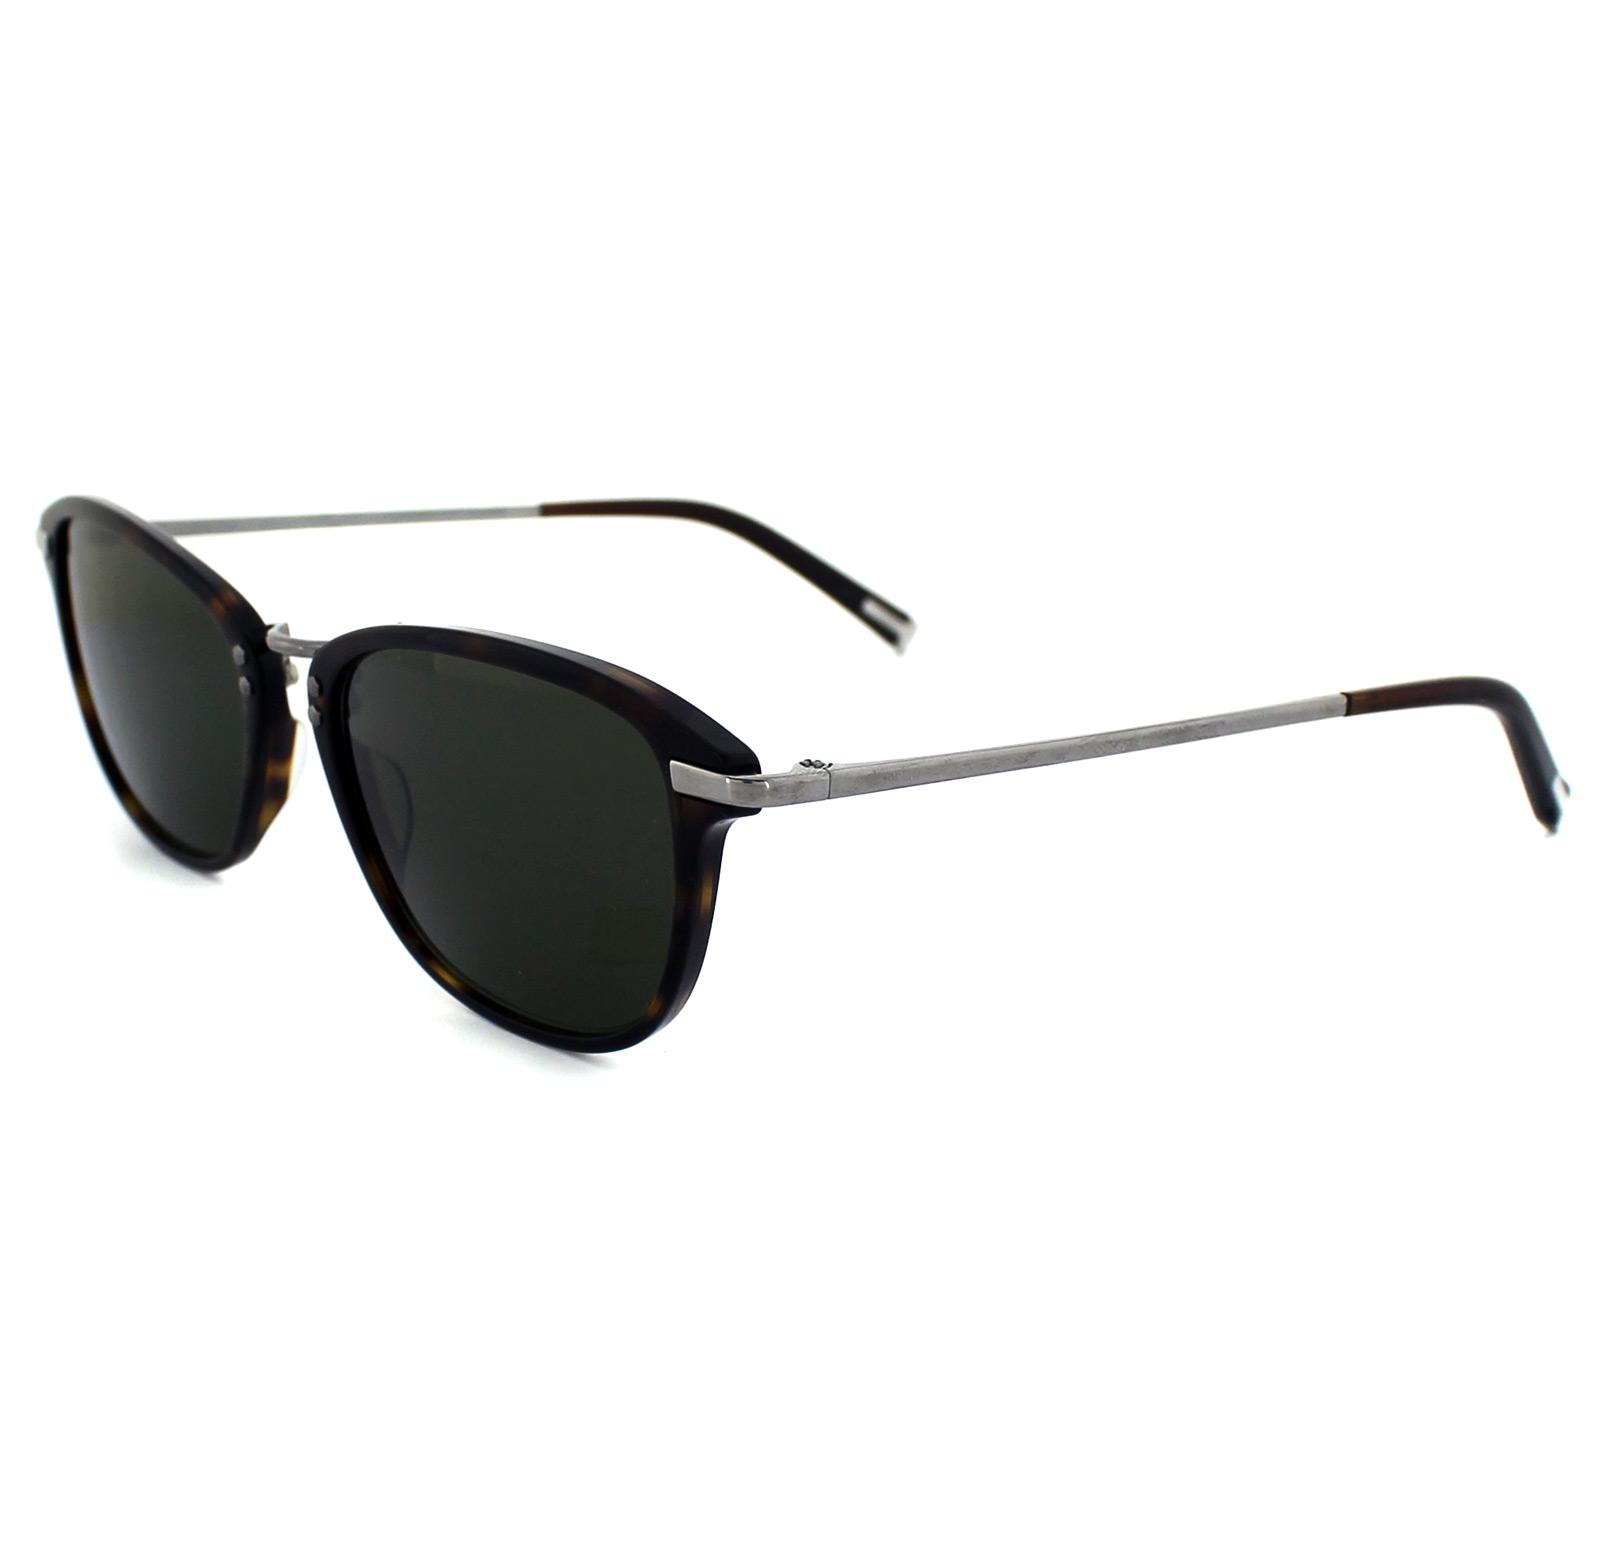 0fe3f2c878f6 Calvin Klein Sunglasses 7106S 214 Havana Green 750778935928